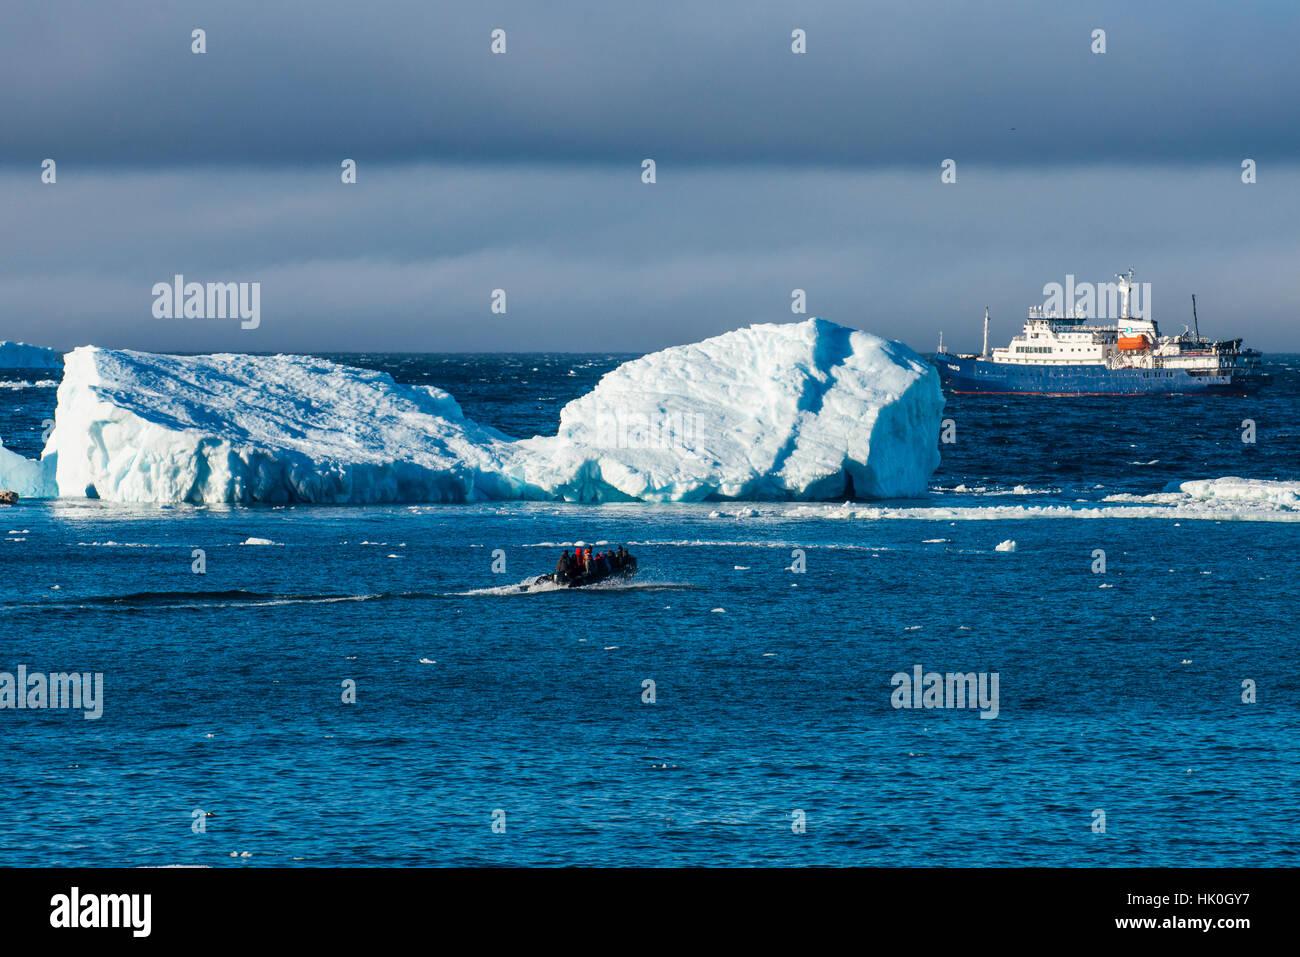 Zodiac cruising back to a cruise ship anchoring behind an iceberg, Brown Bluff, Antarctica, Polar Regions - Stock Image